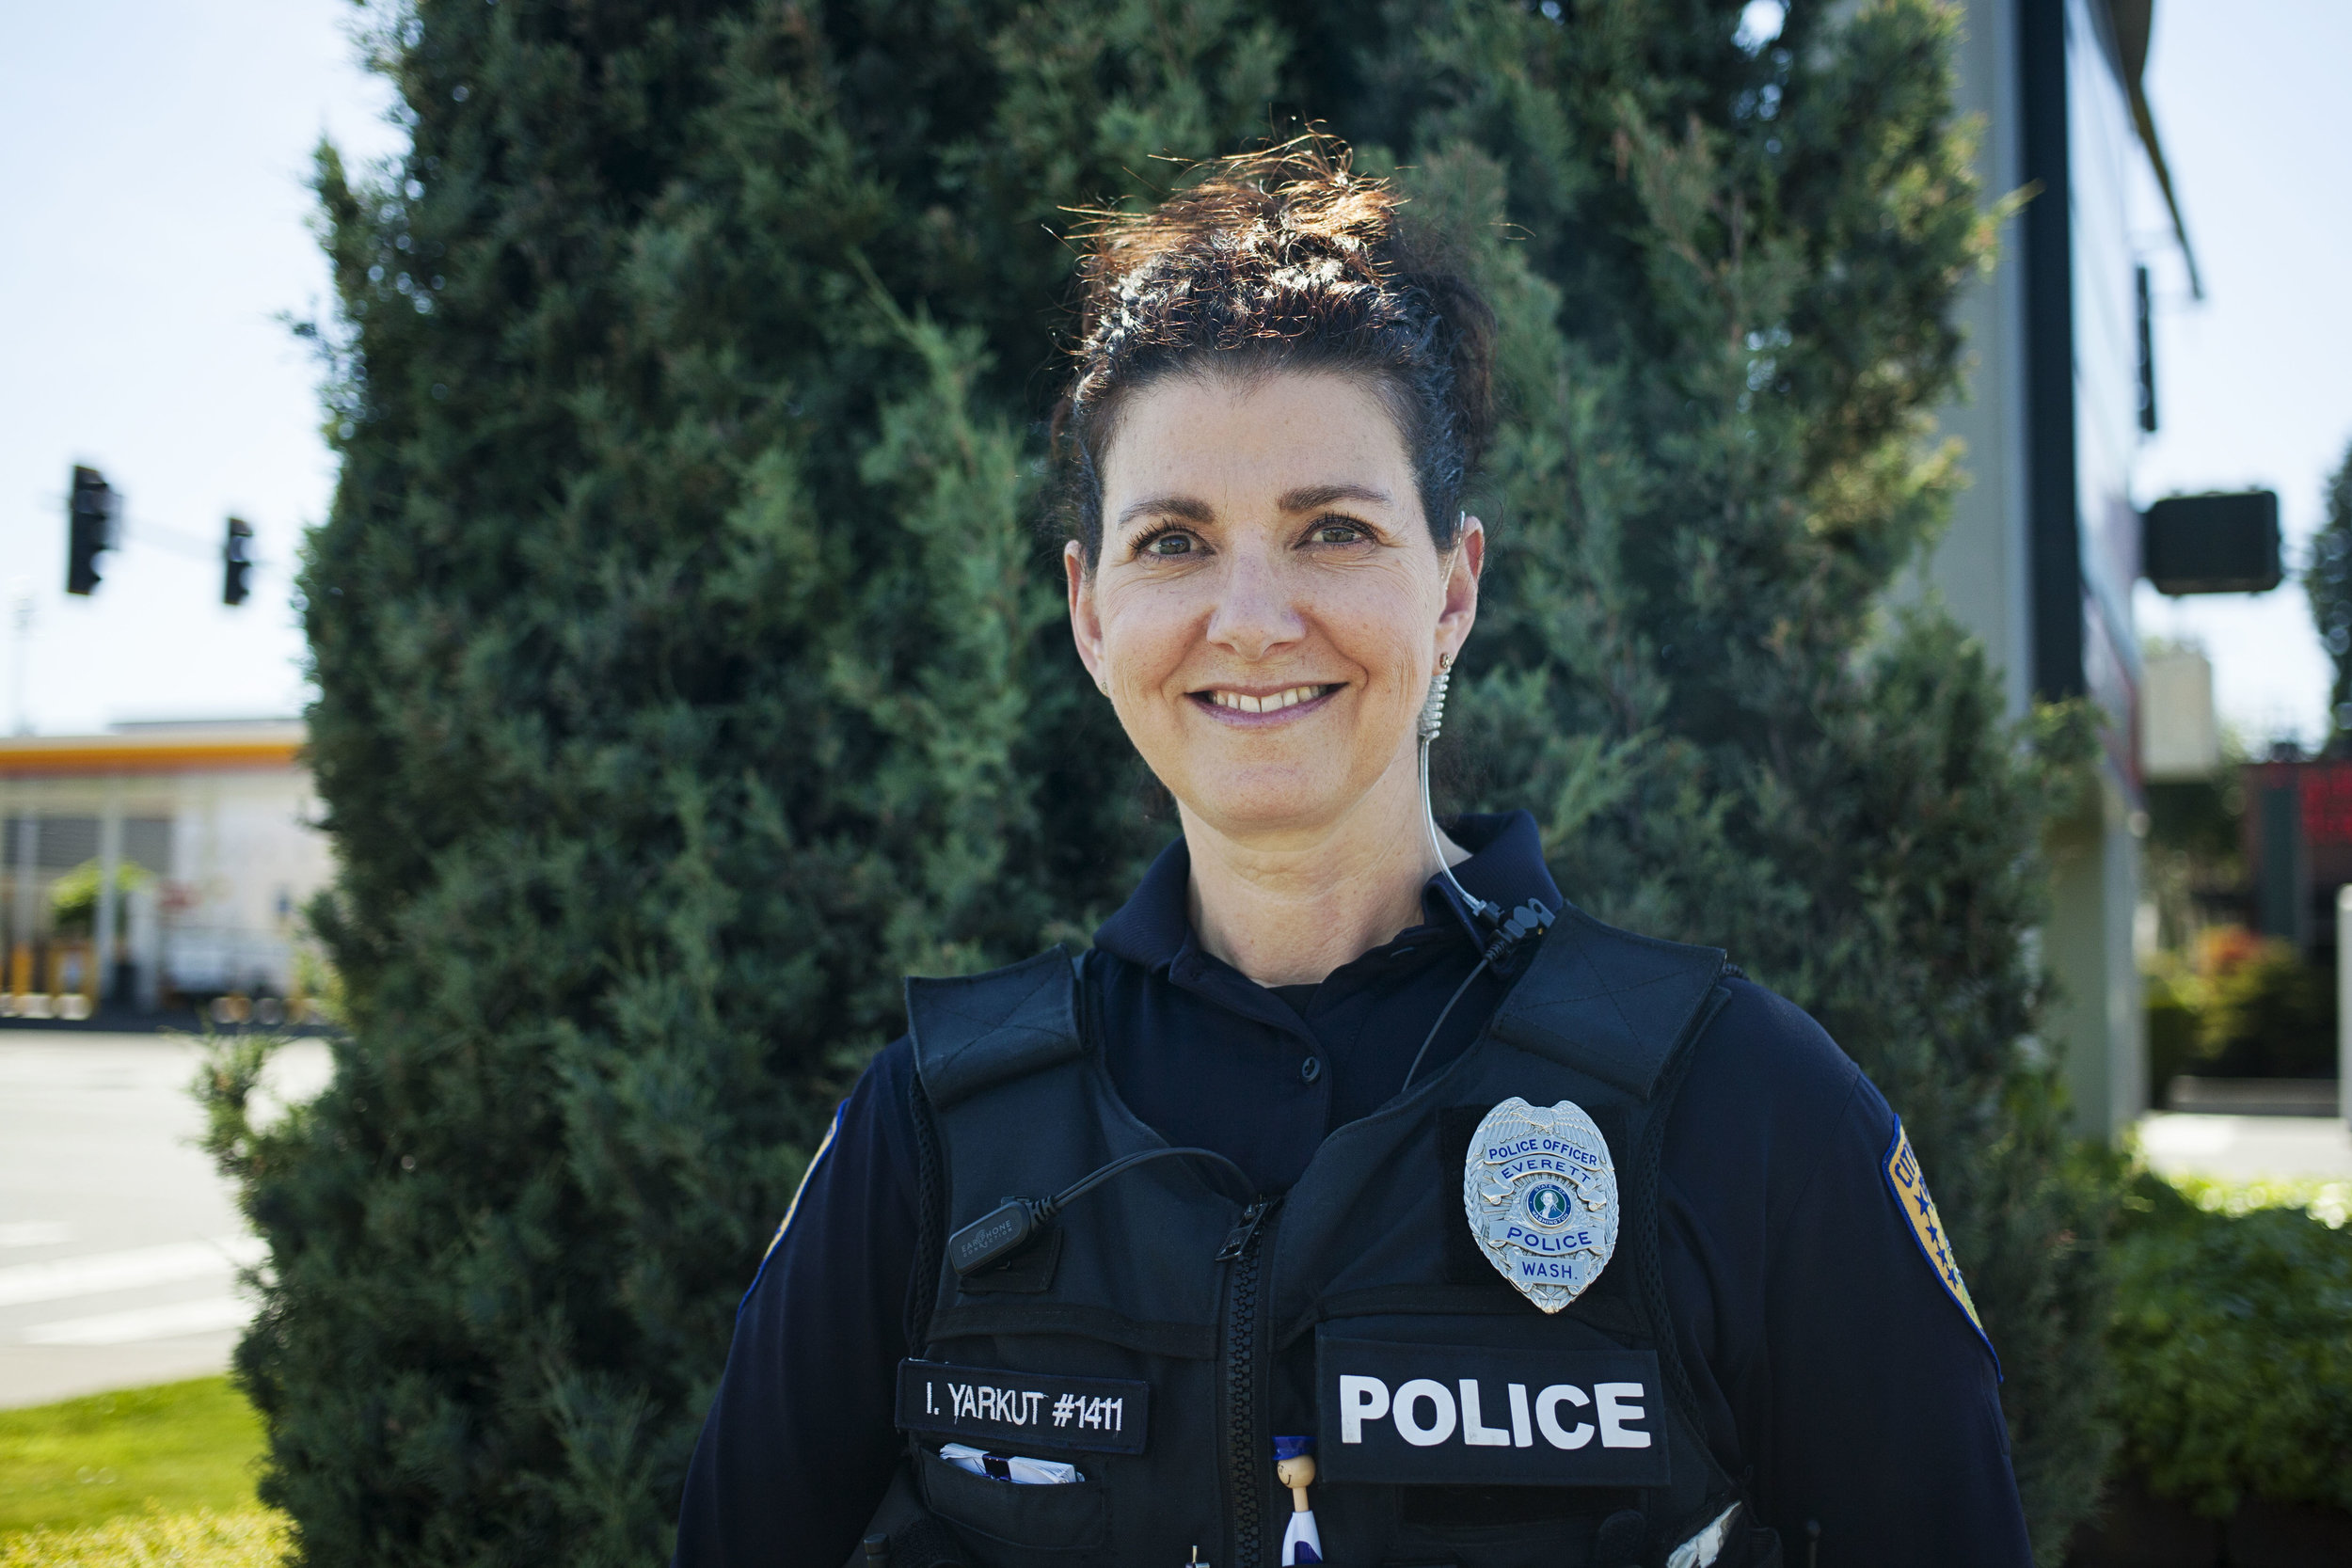 Officer Inci Yarkut.   CREDIT: DANA MCGLOCKLIN for FINDING FIXES. May 23, 2019. >>